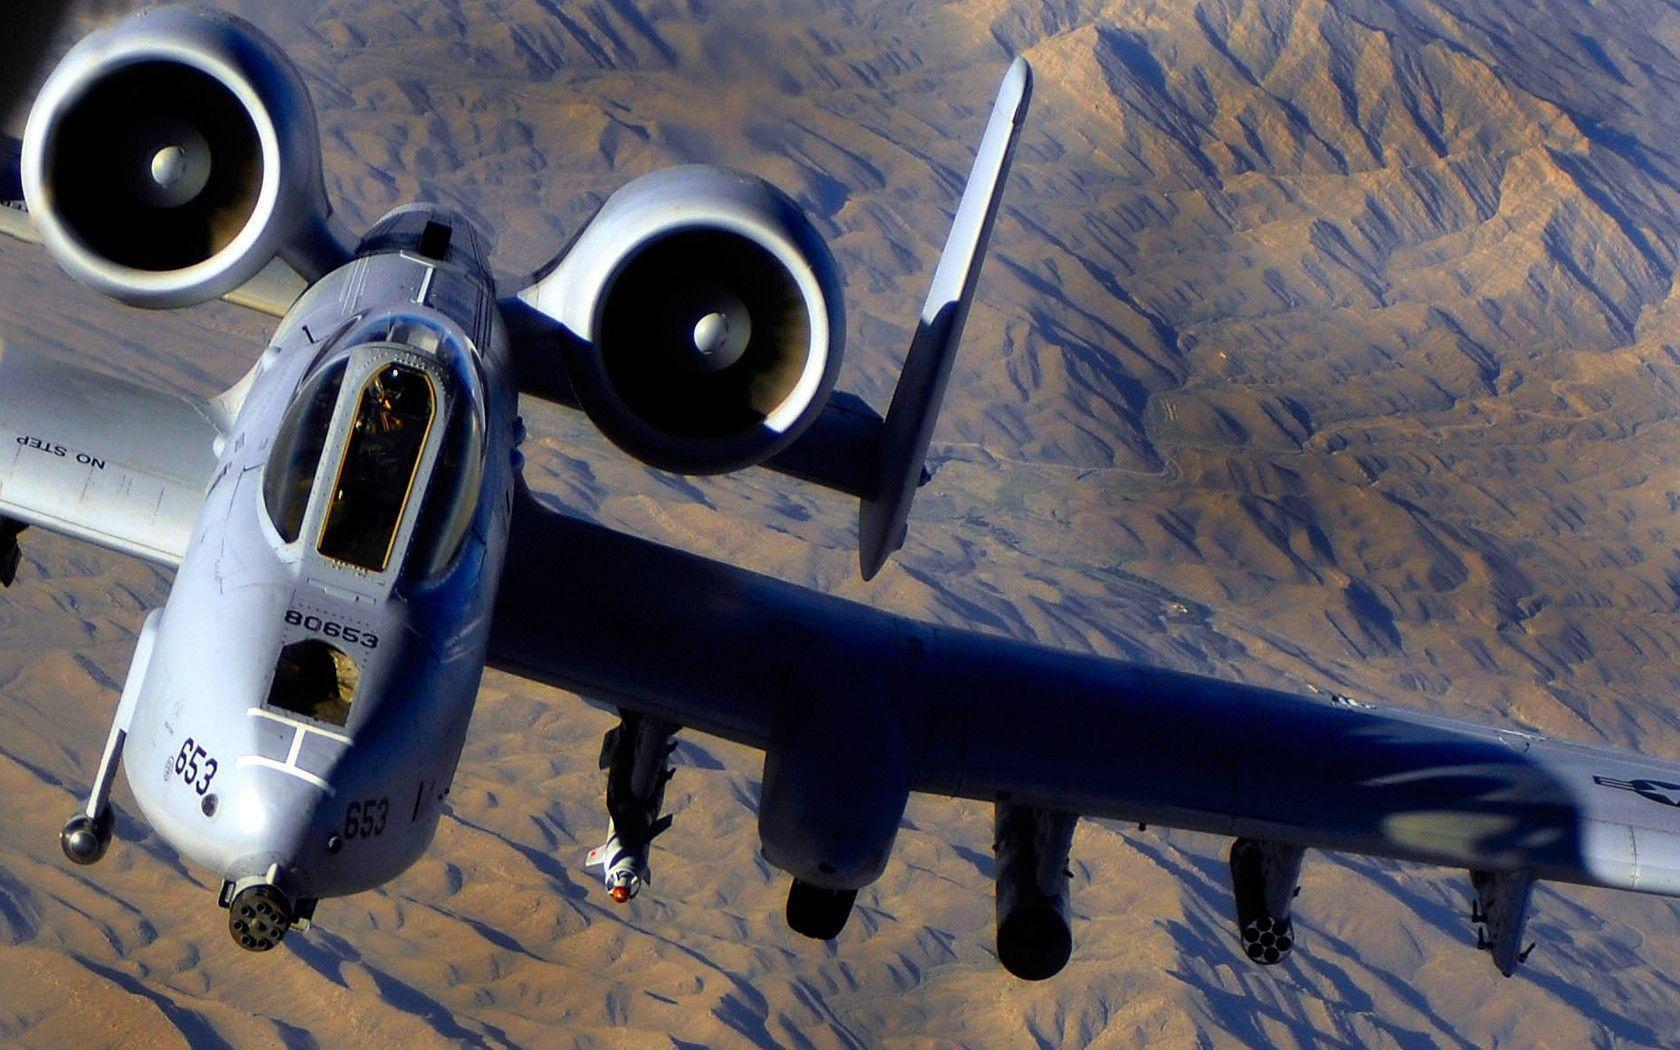 Fairchild Republic A-10 Thunderbolt II Wallpapers ...